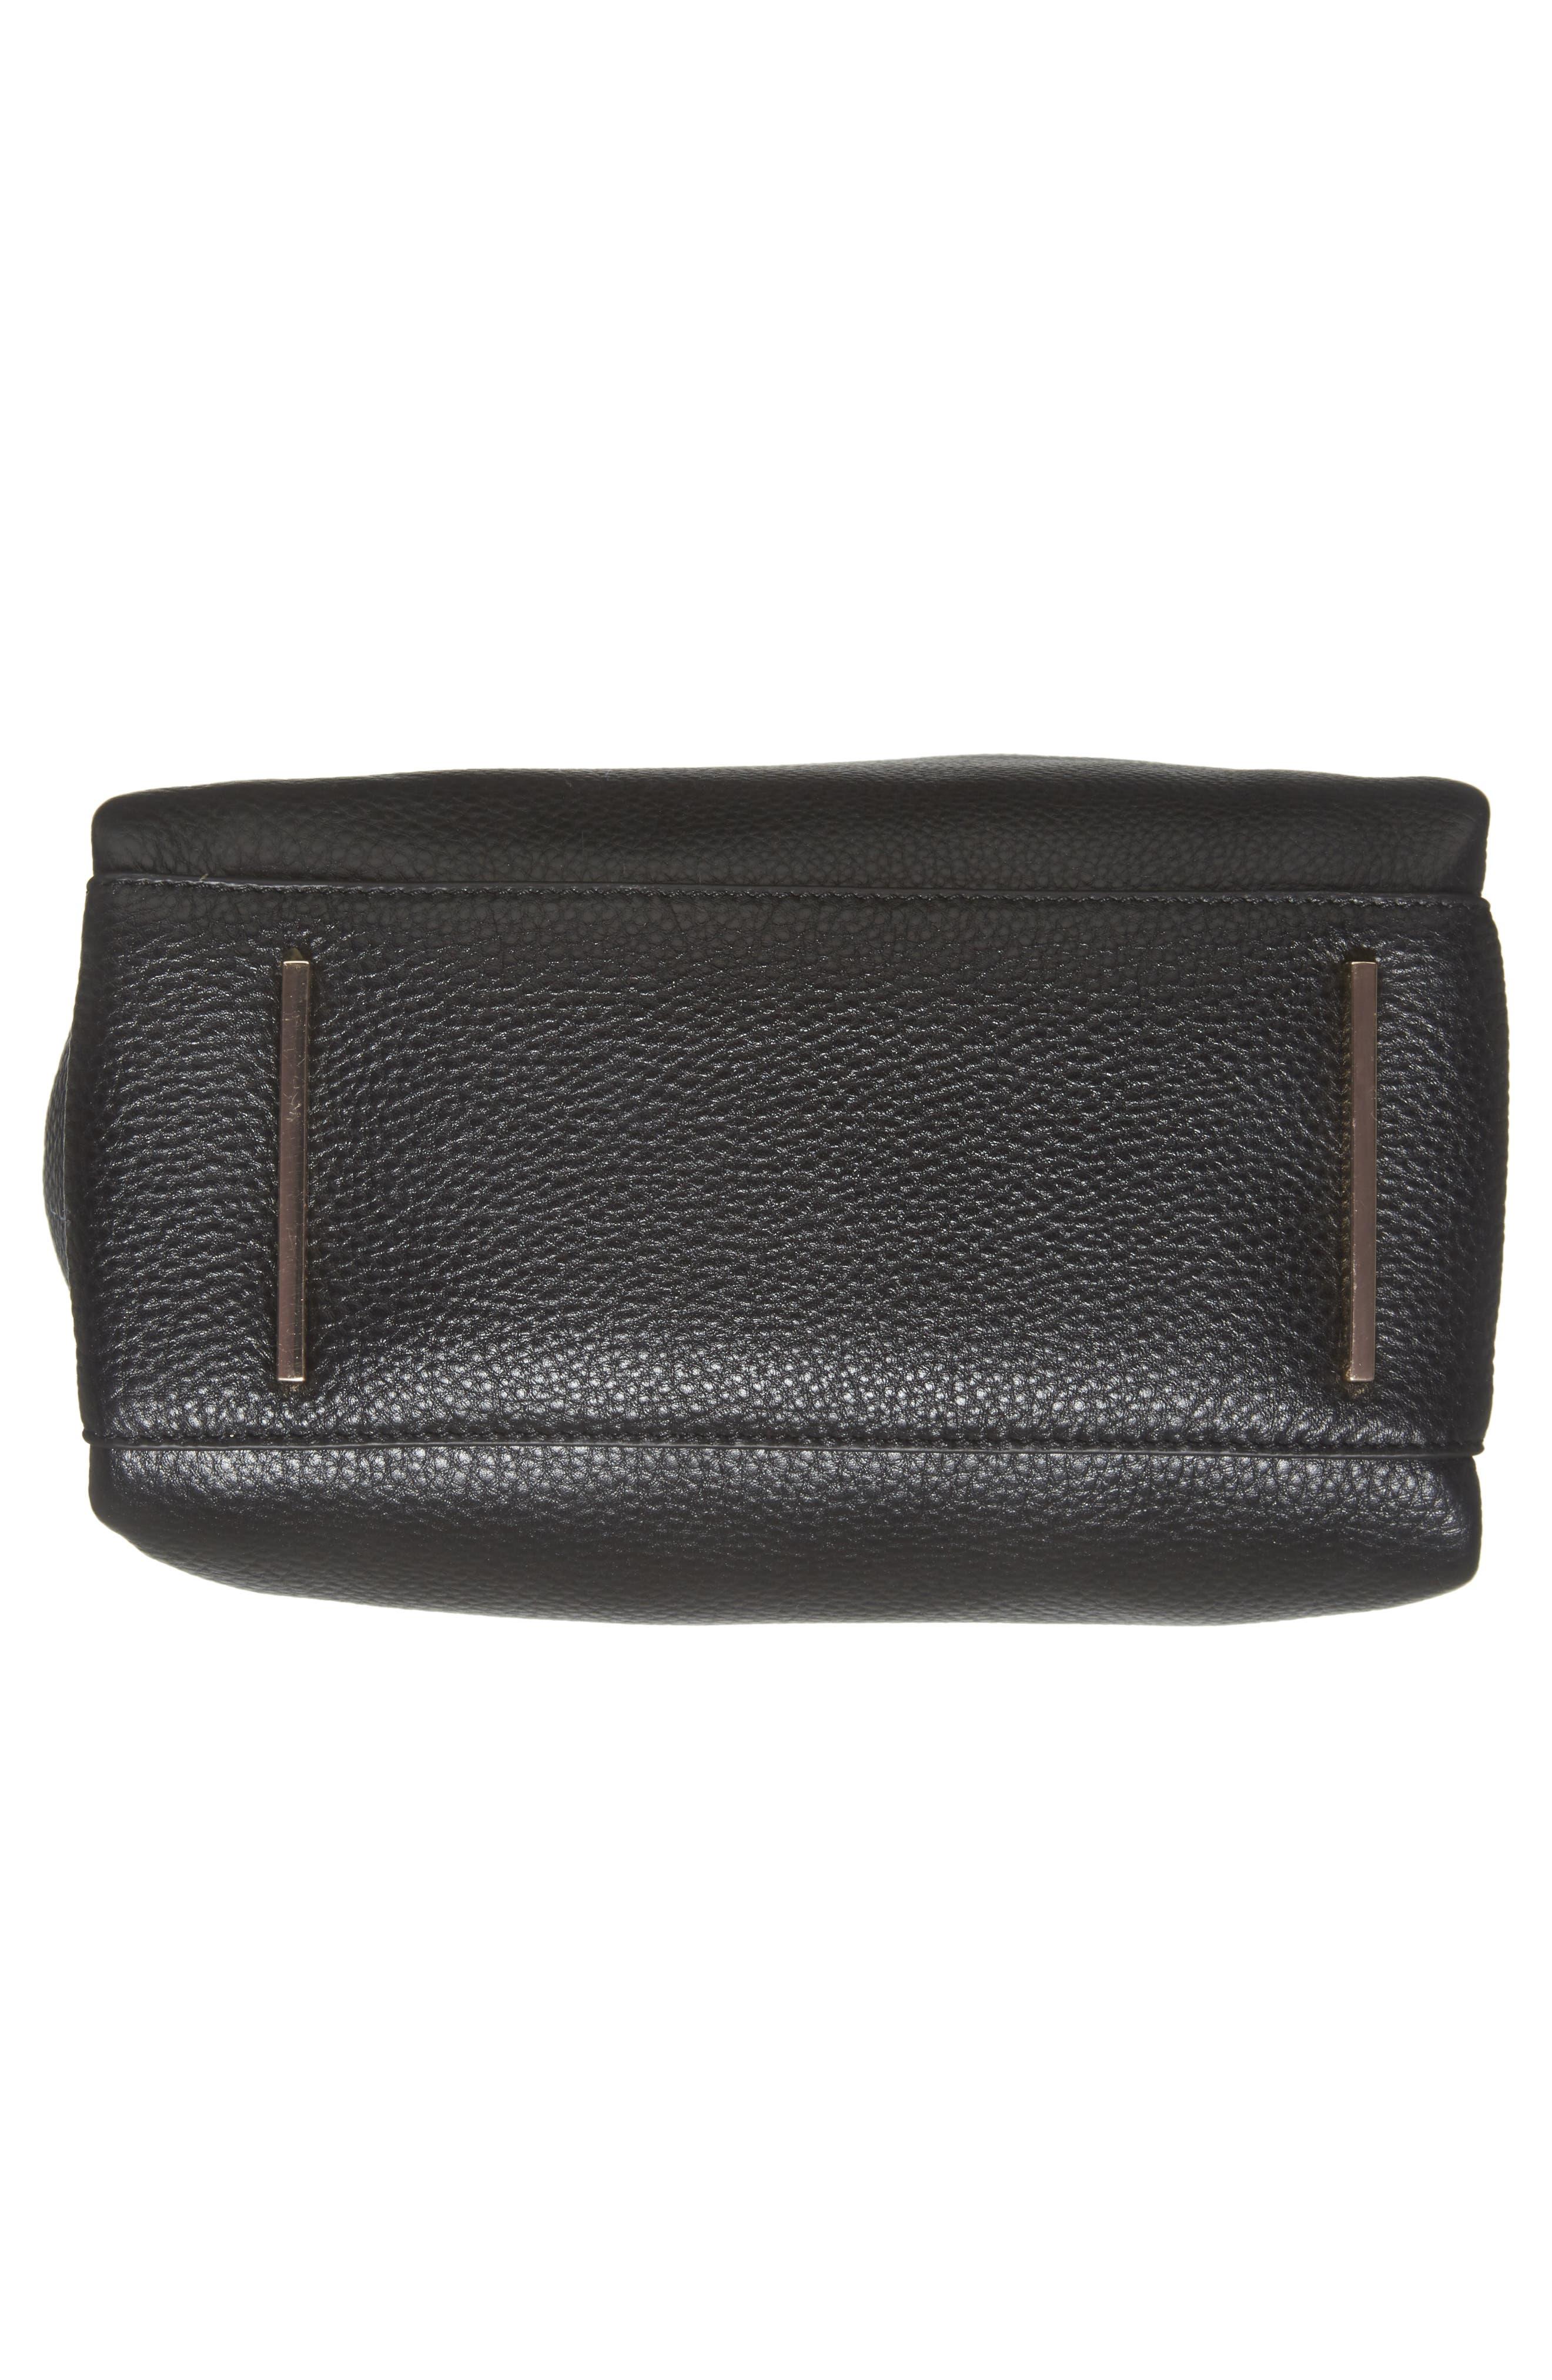 Céline Dion Small Adagio Leather Satchel,                             Alternate thumbnail 26, color,